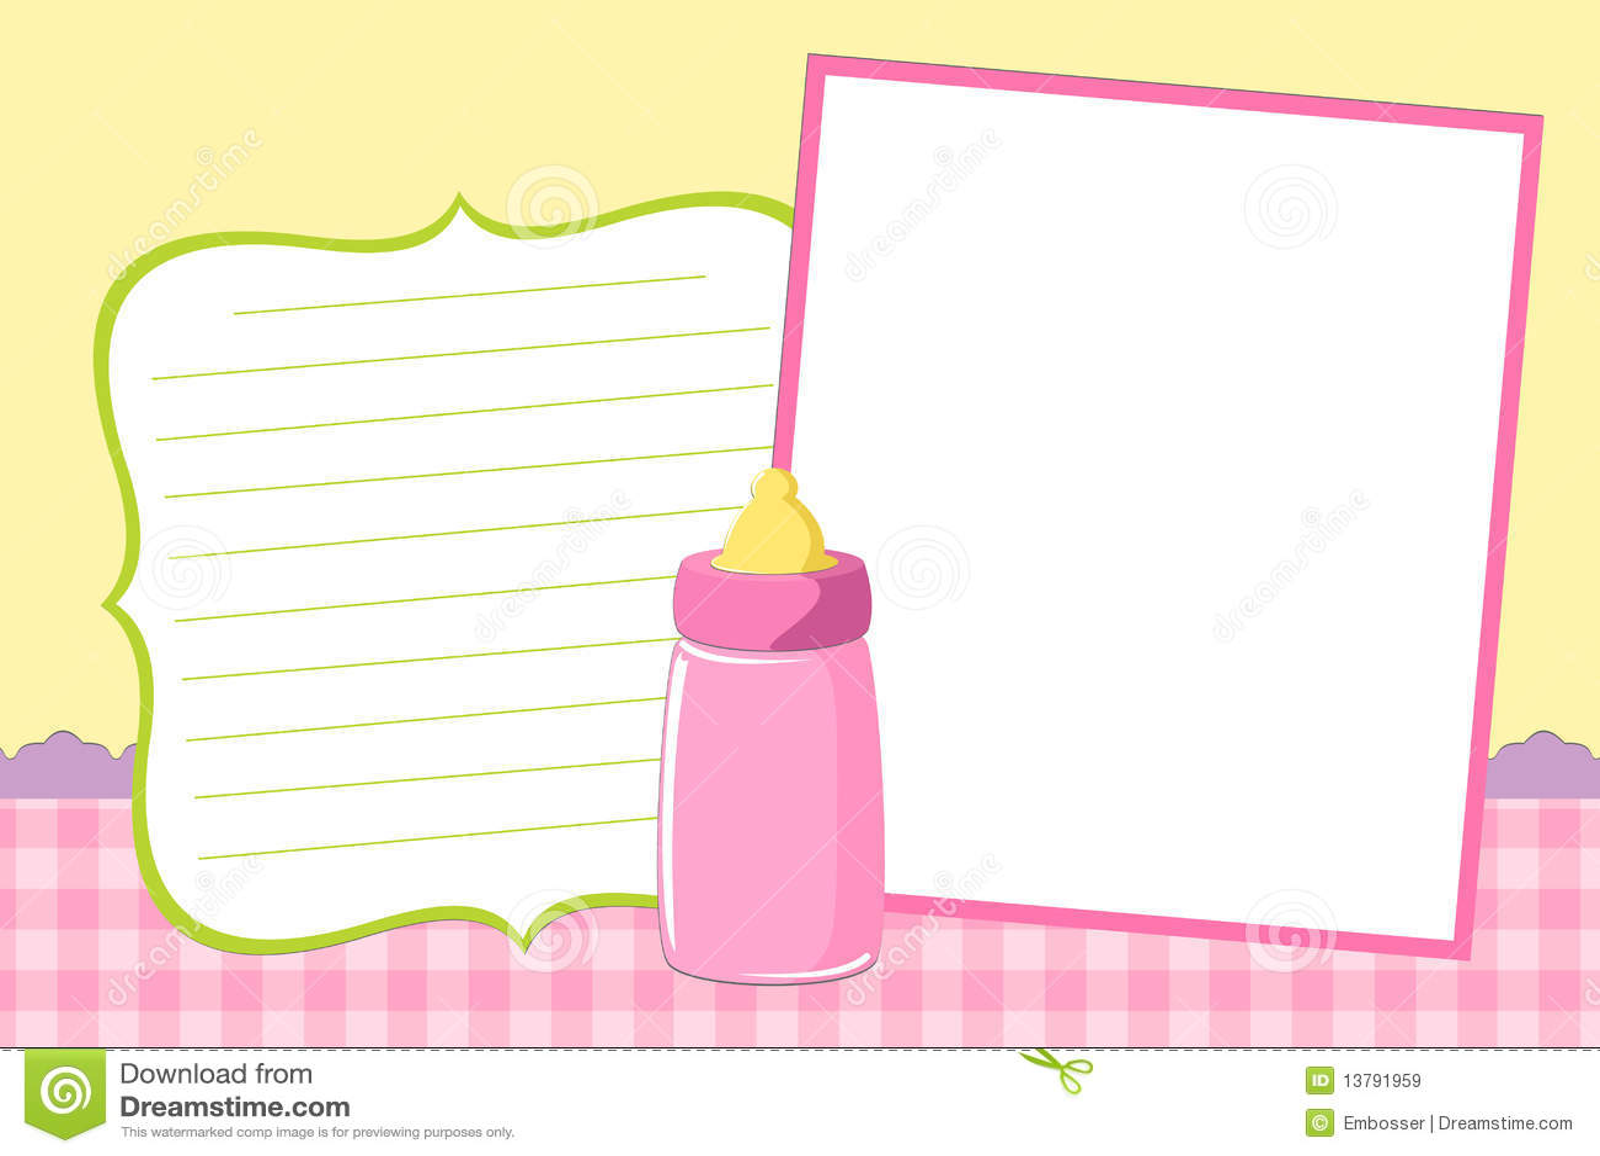 Template For Baby S Photo Album Stock Vector